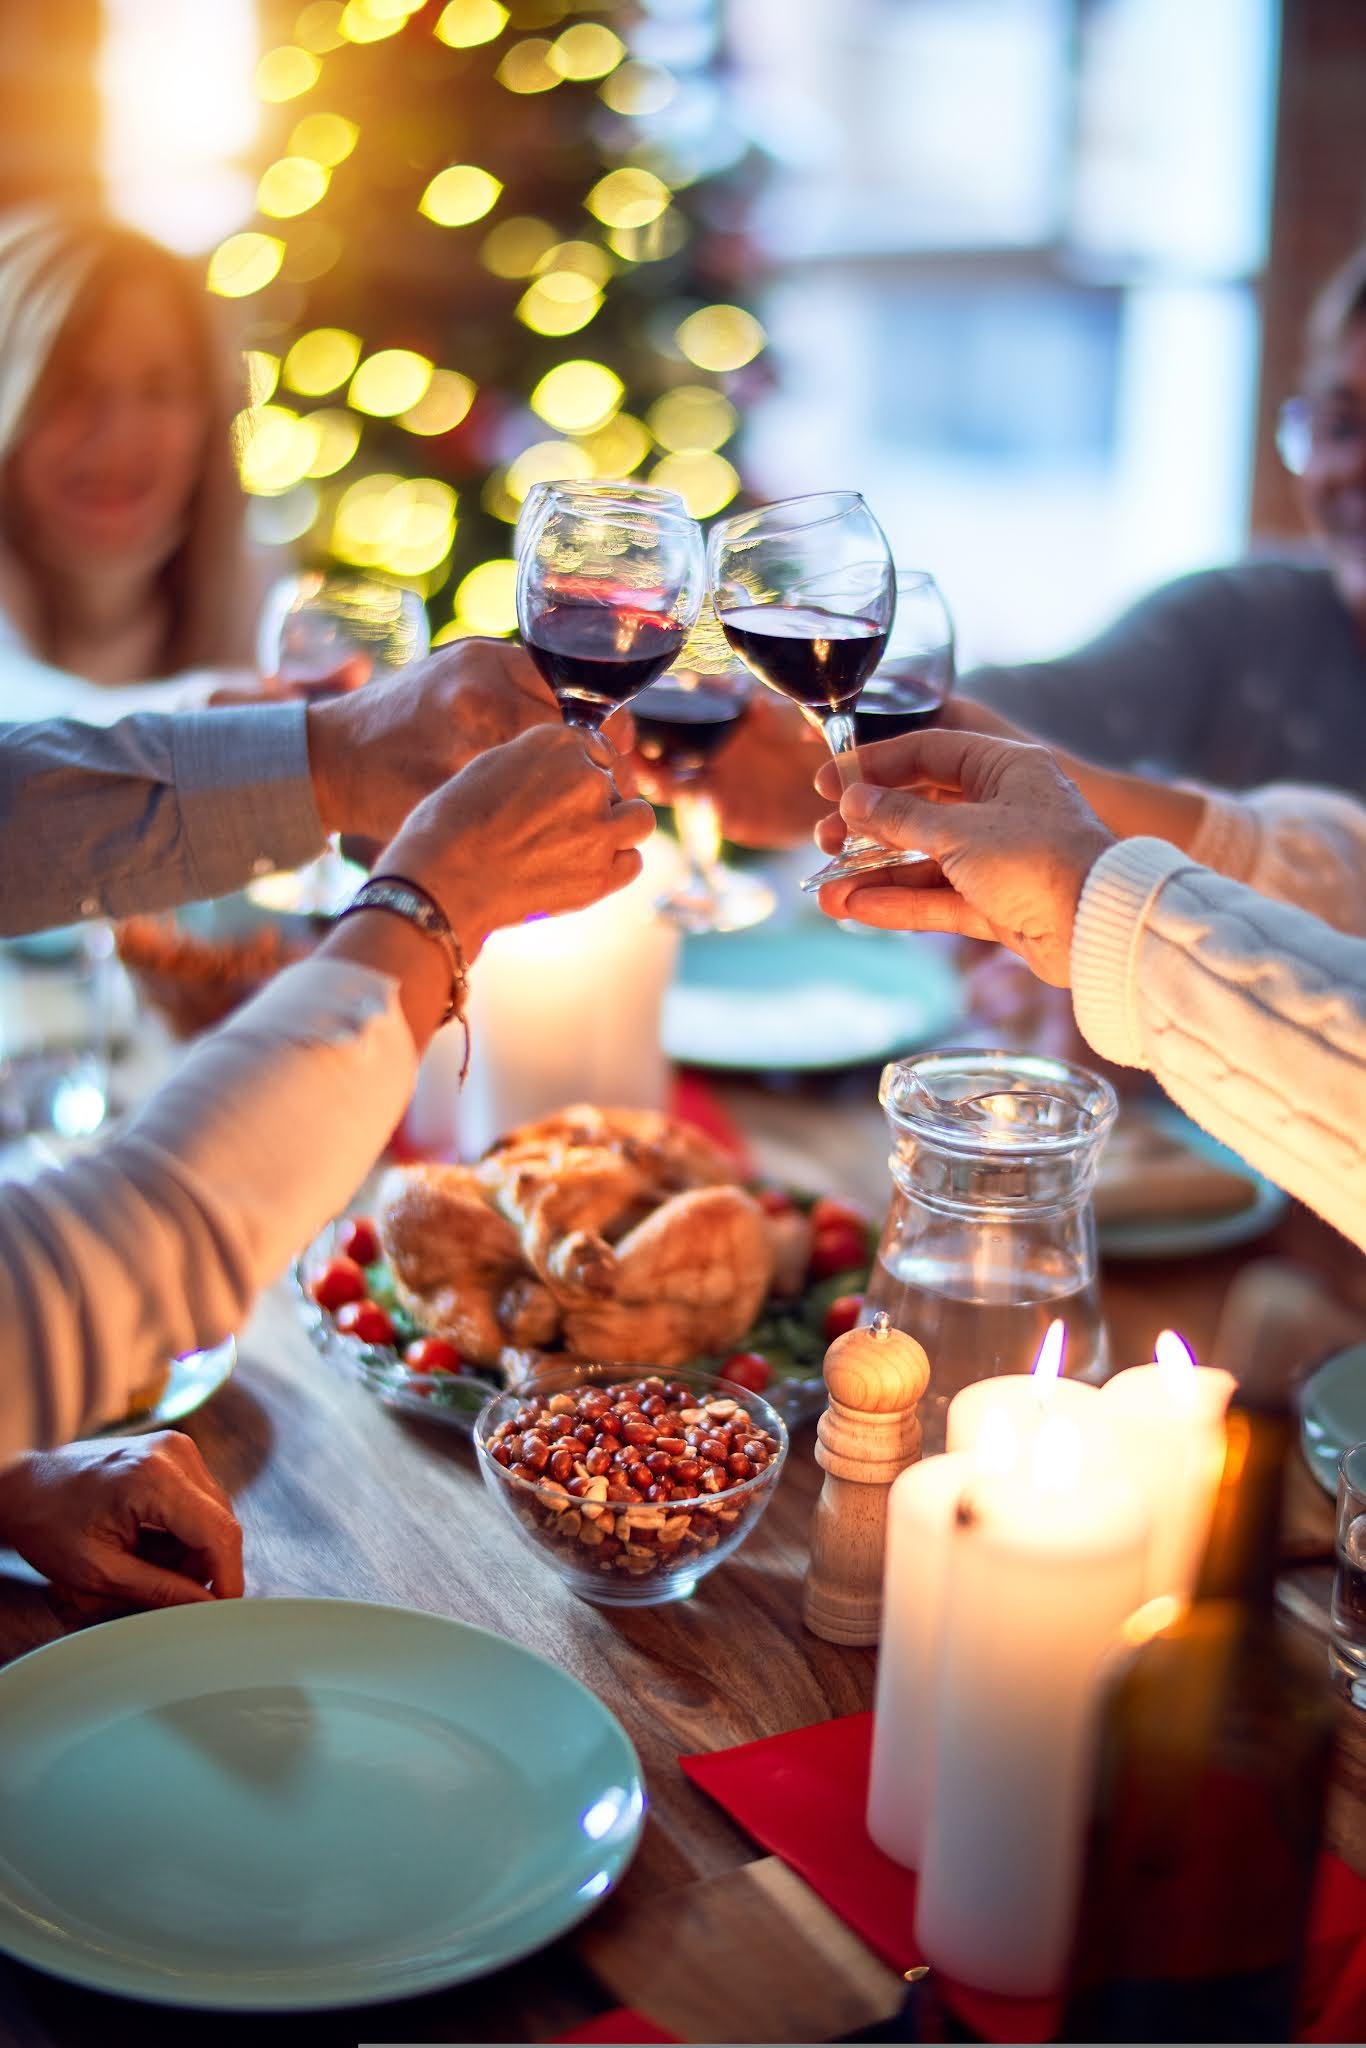 Why Celebrating Your Accomplishments Is Strategic